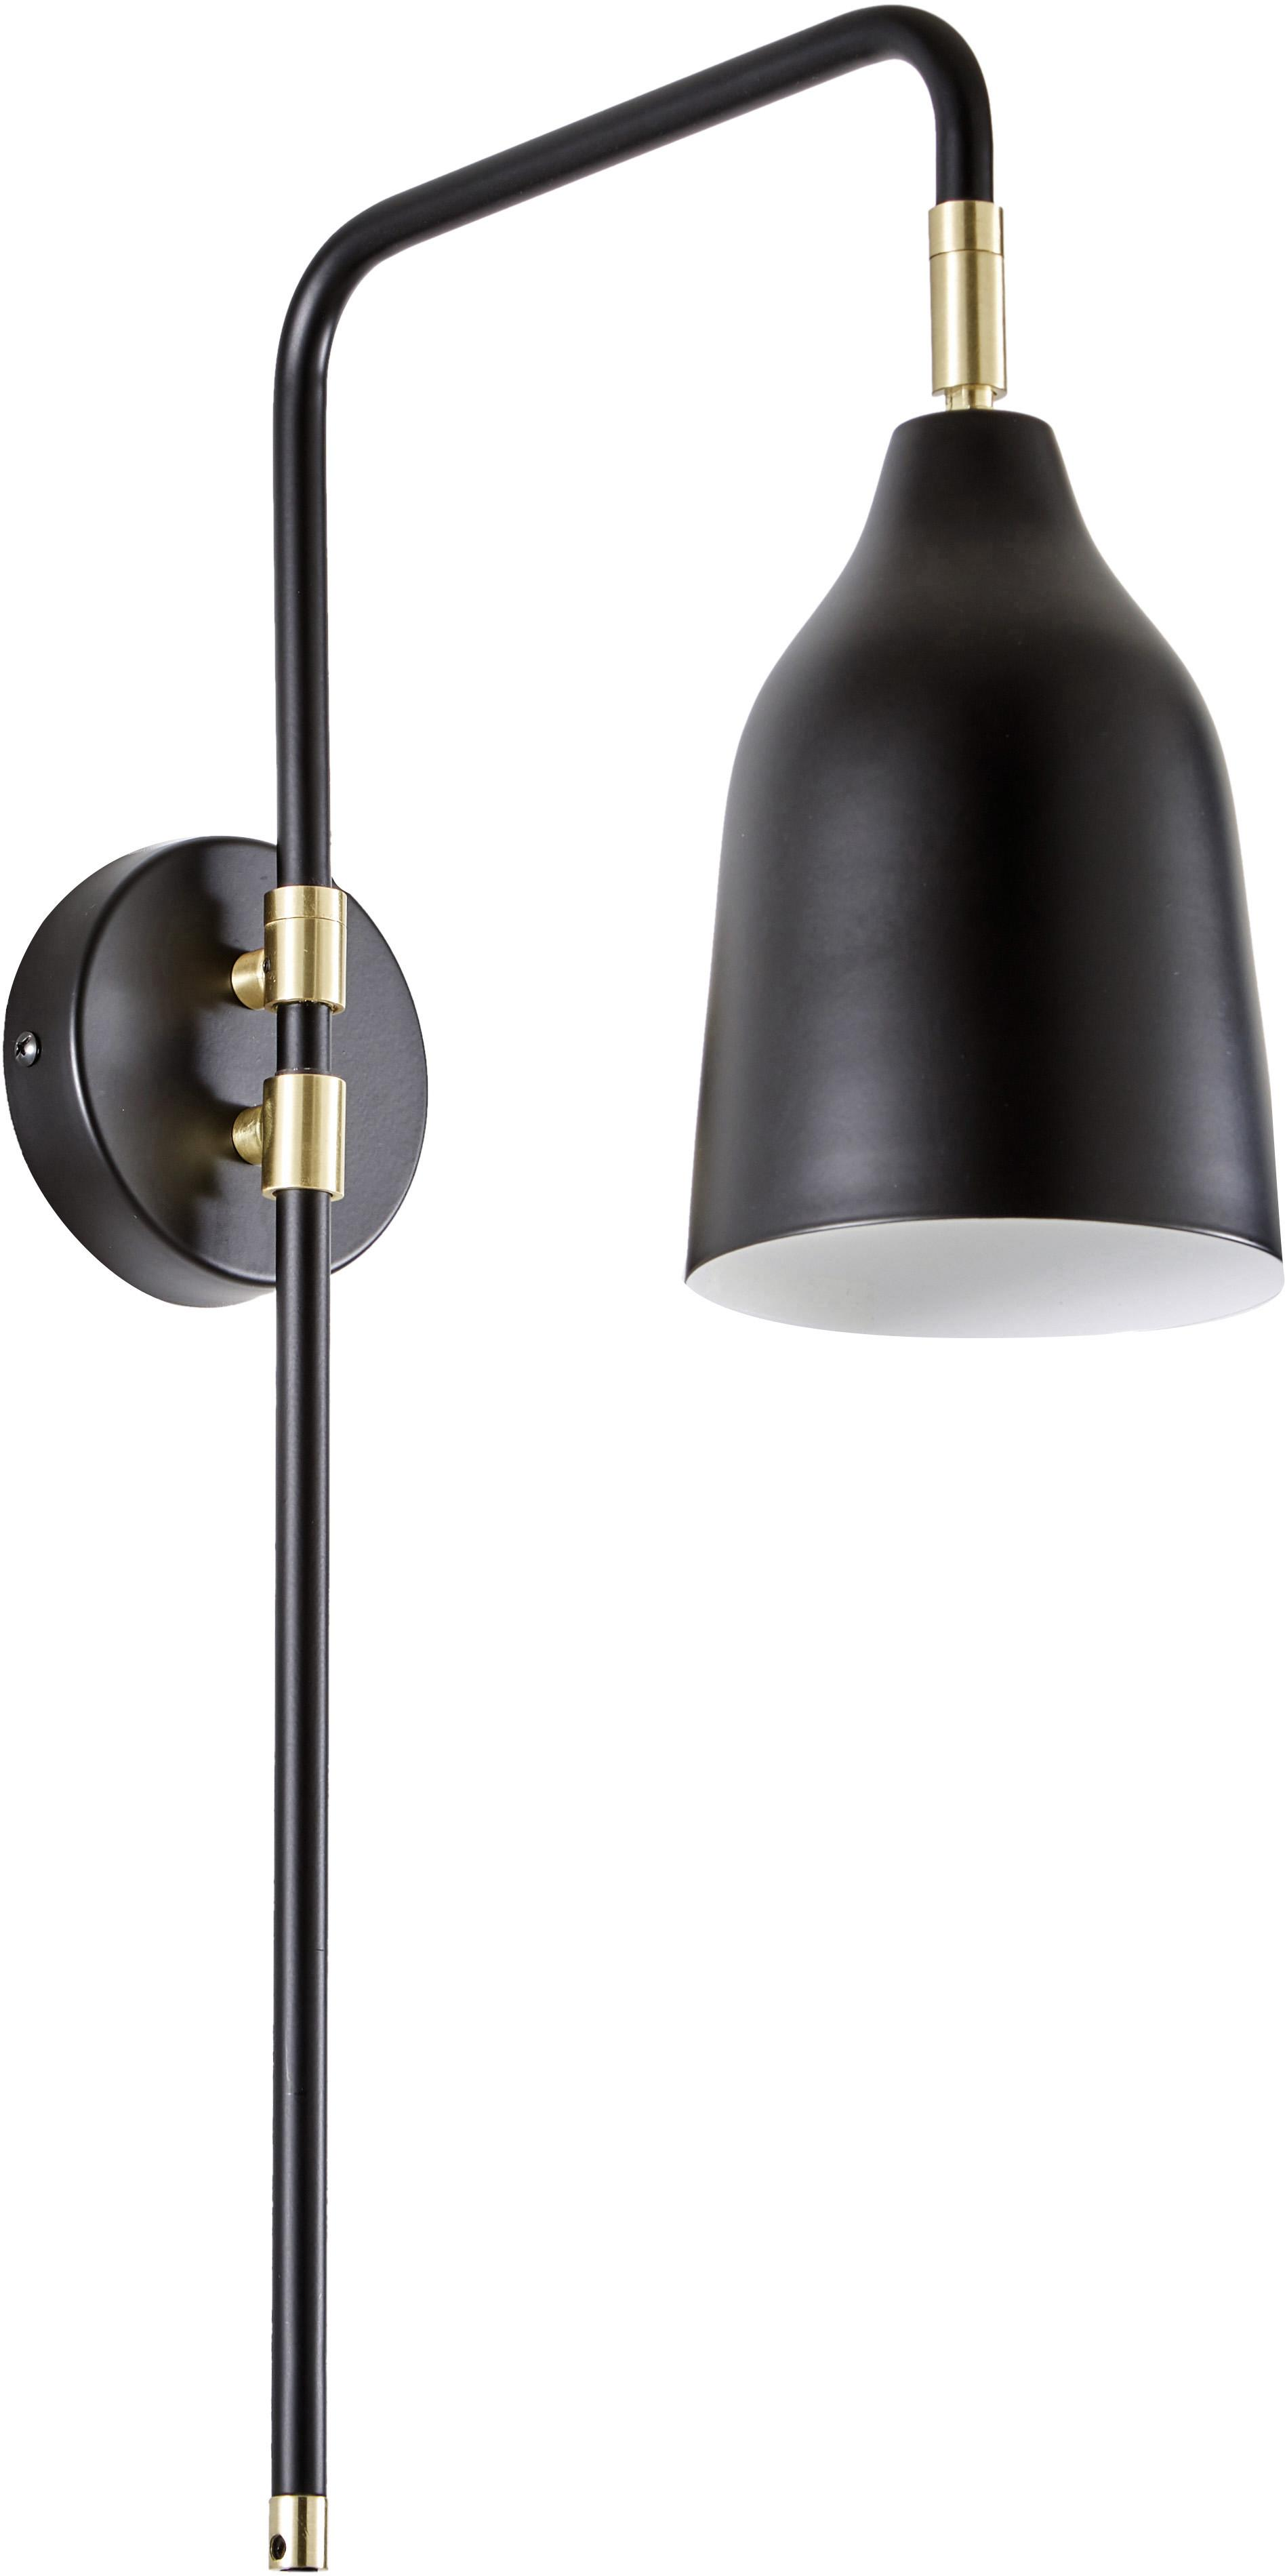 Wandlamp Mora, Zwart, goudkleurig, 12 x 50 cm